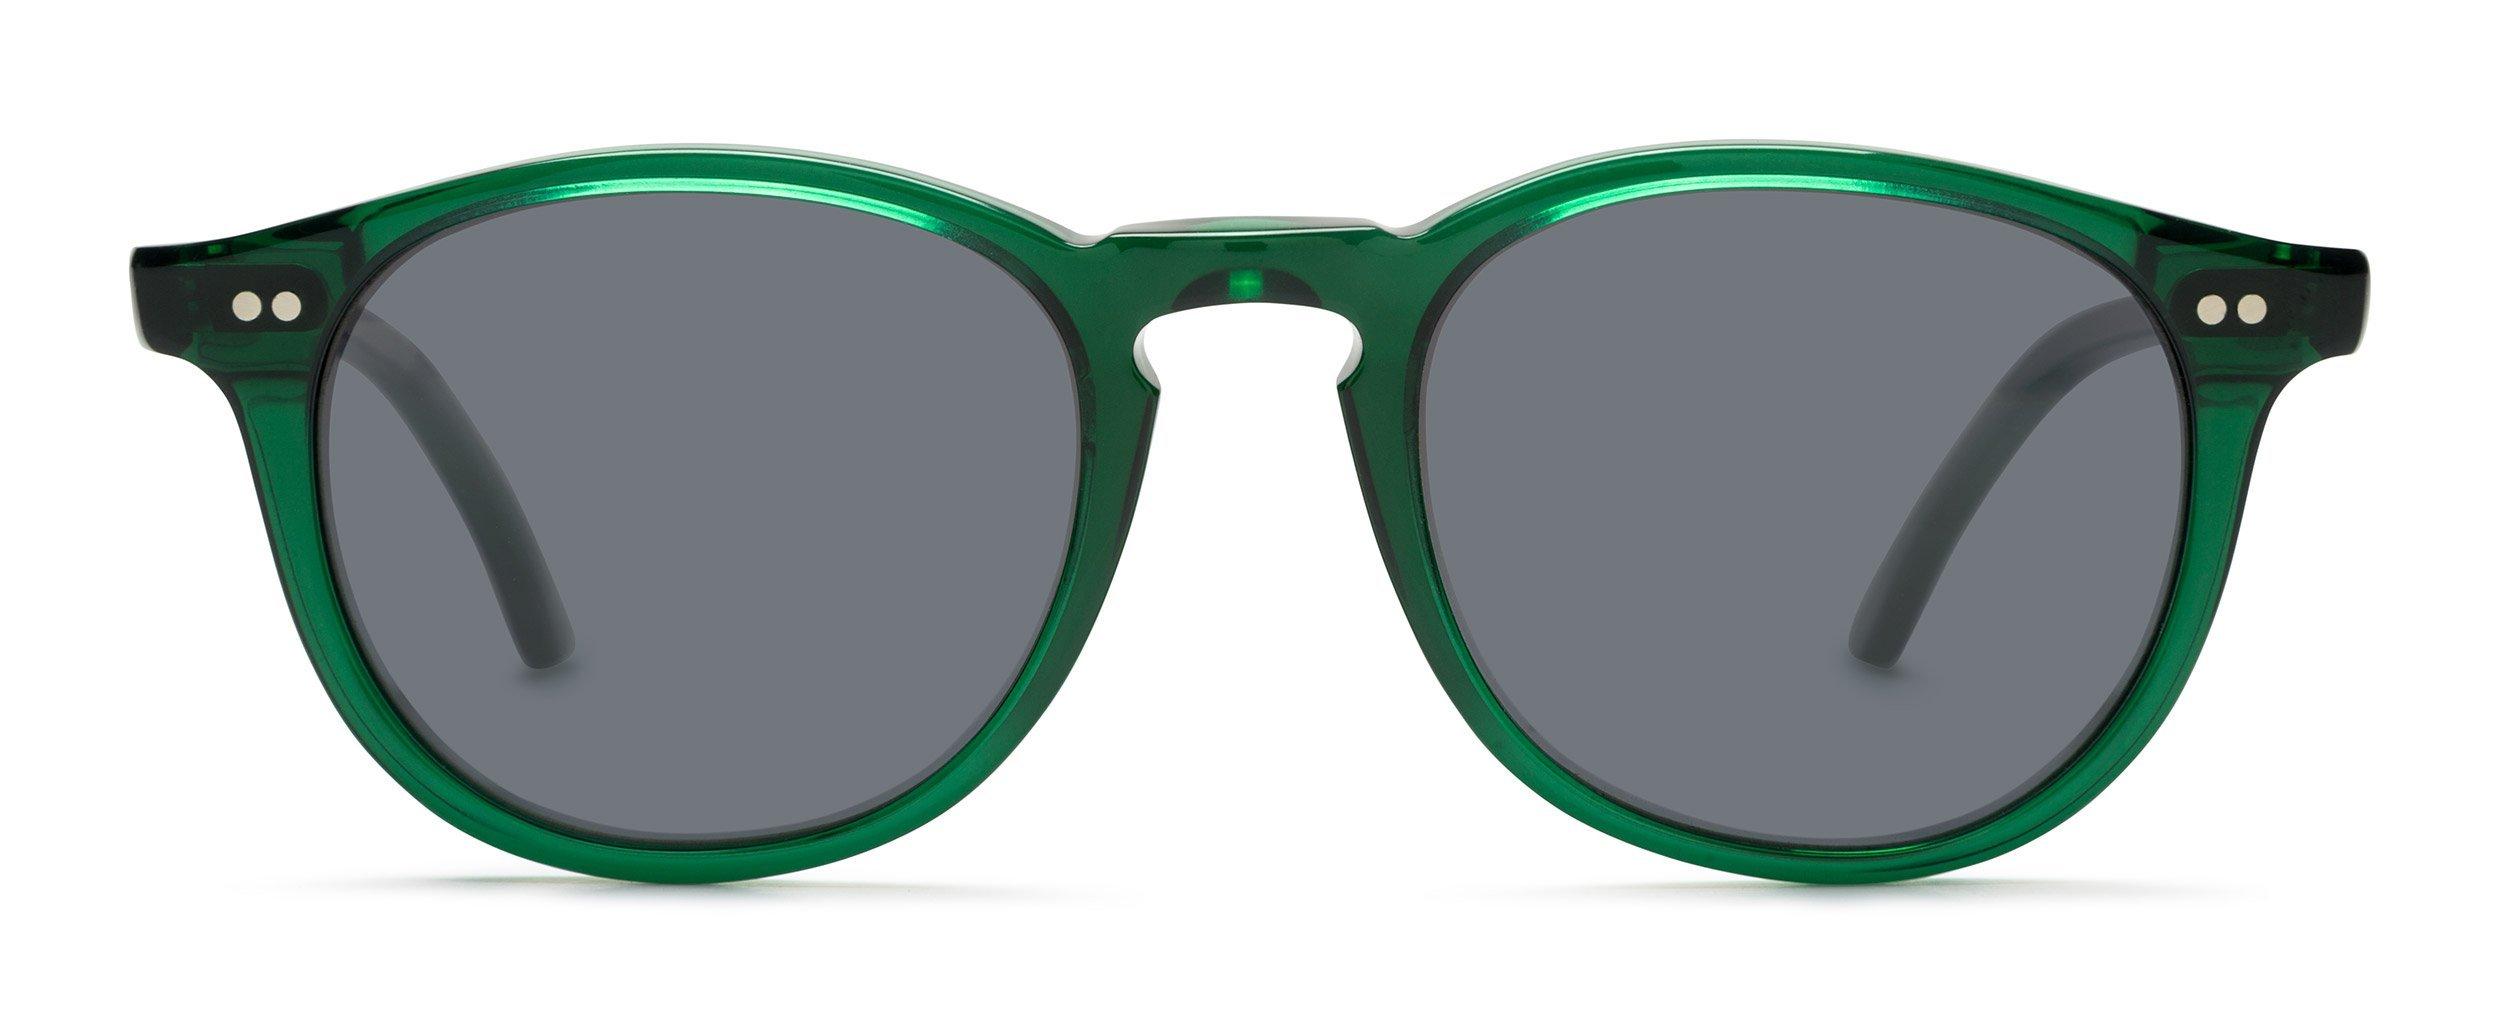 F-emerald